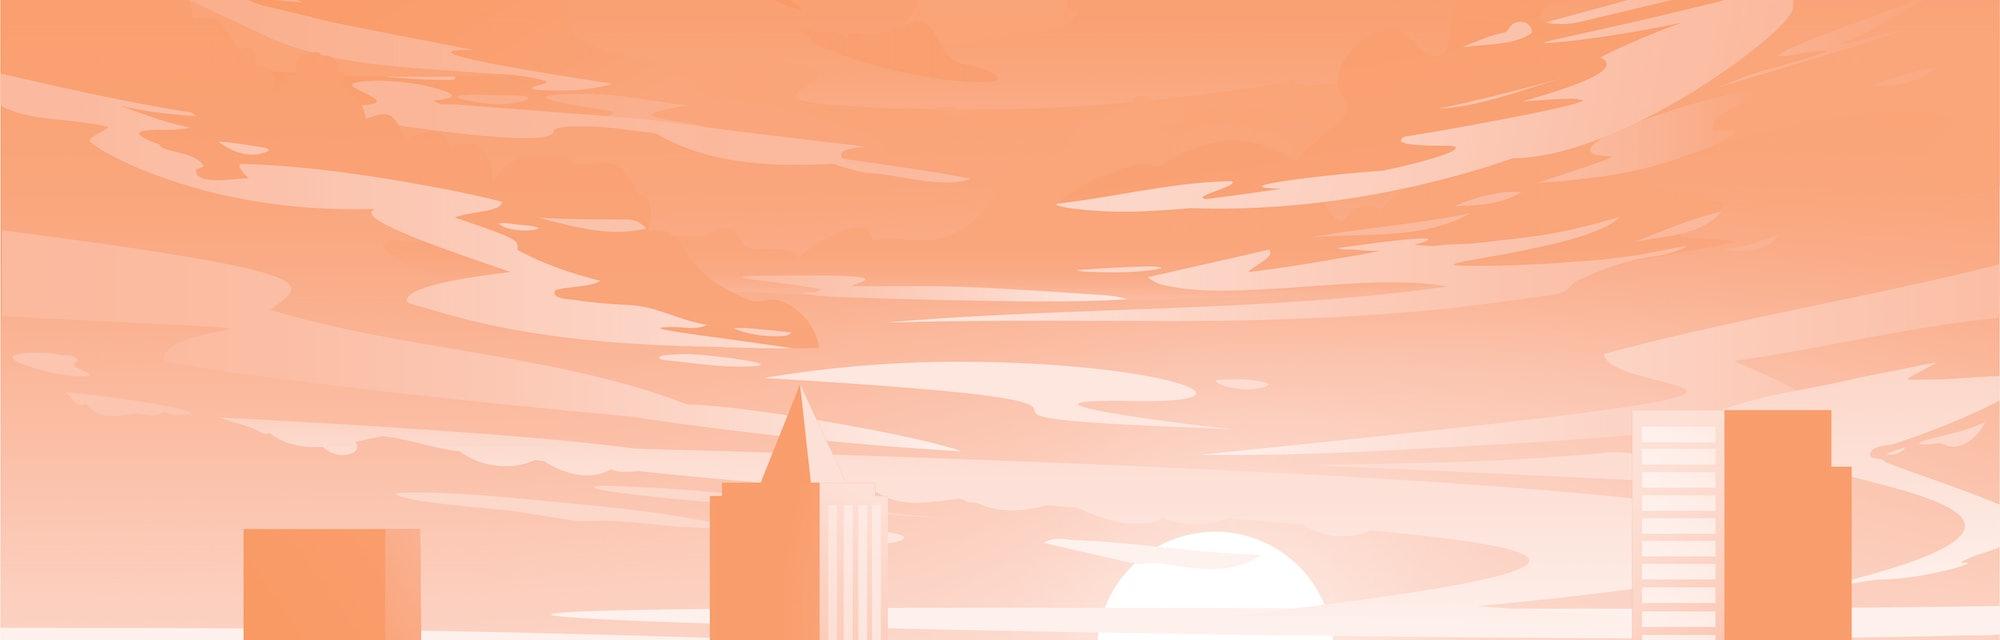 Evening city panorama, vector, sunset. Flat anime style